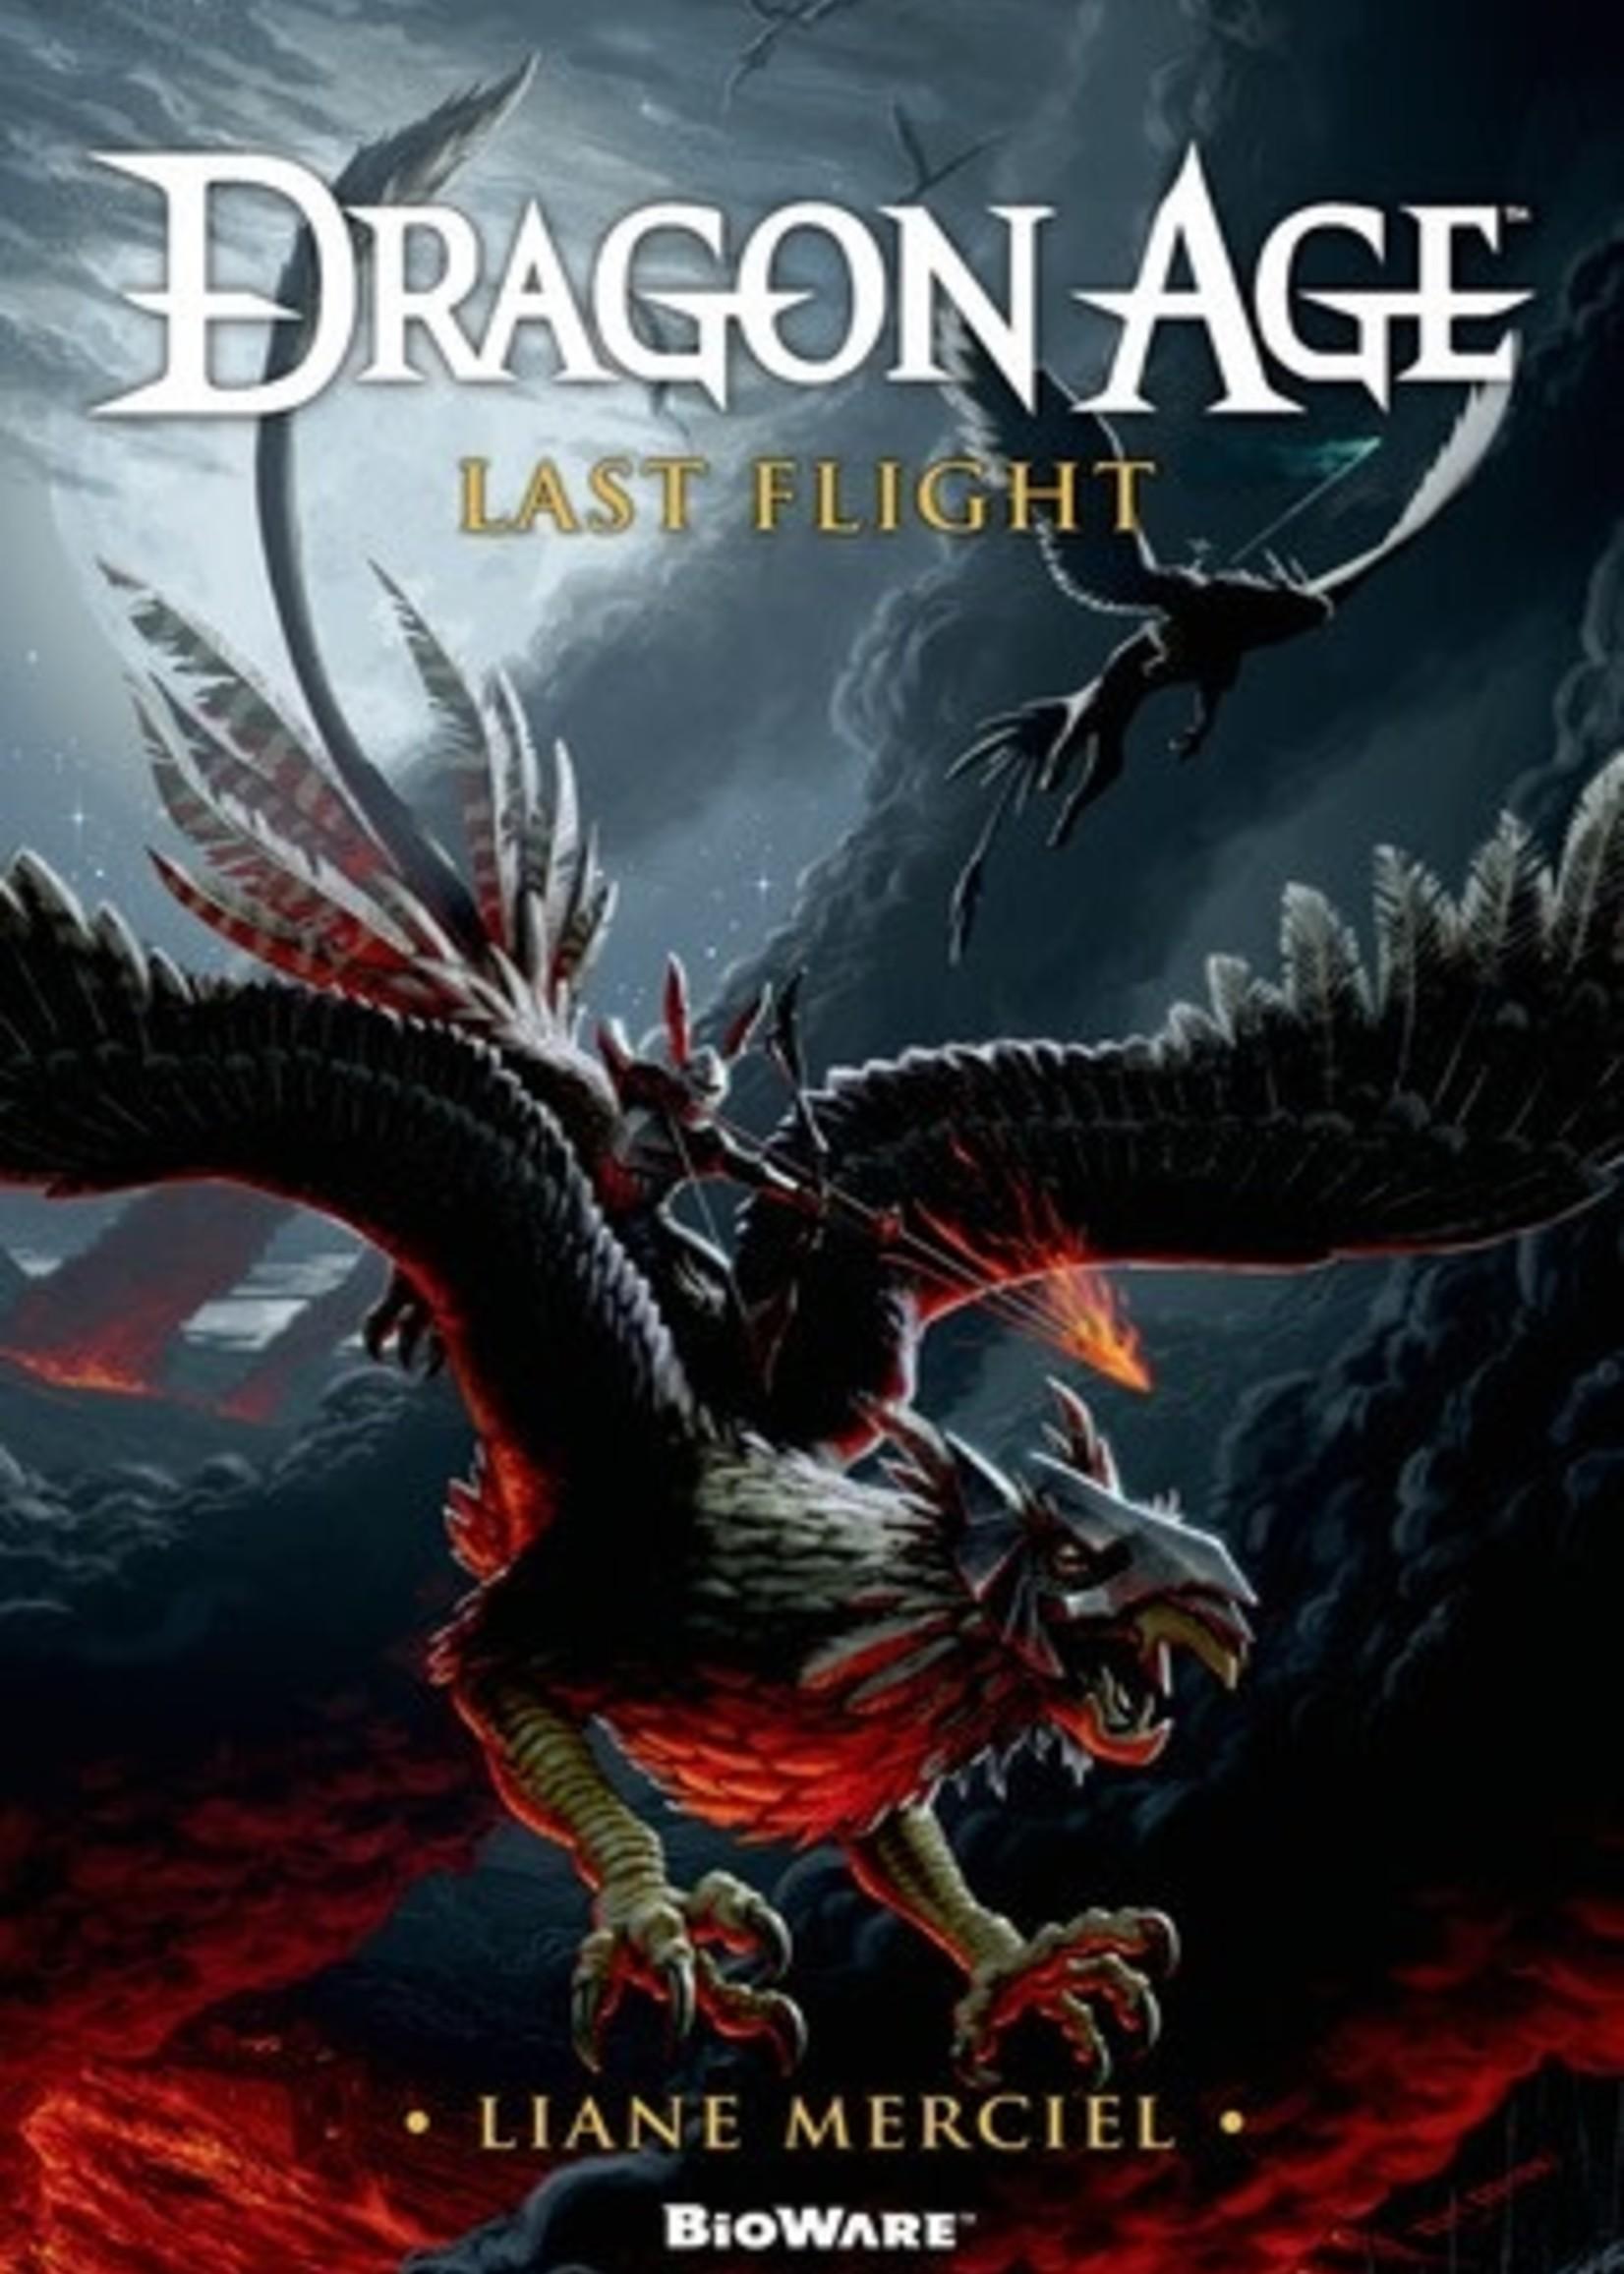 Dragon Age: The Last Flight by Liane Merciel